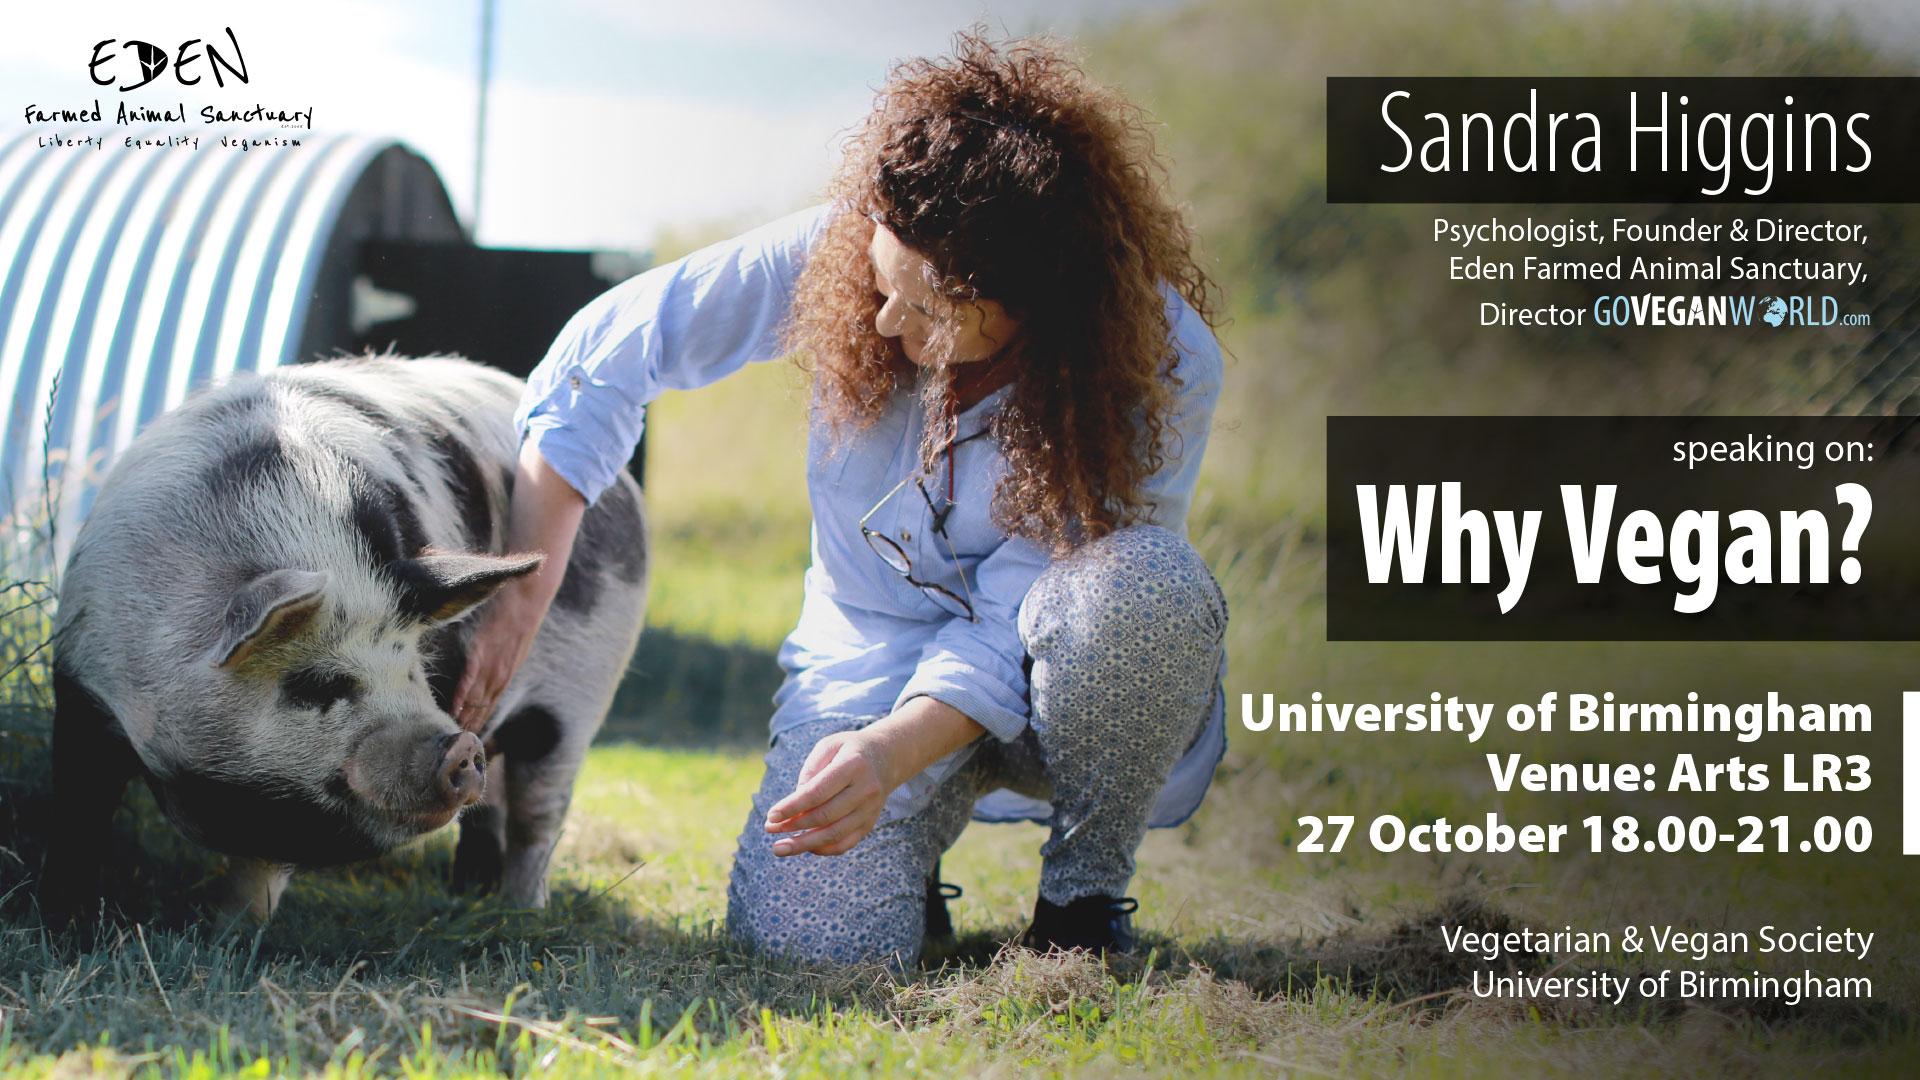 University of Birmingham - Why Vegan - Sandra higgins